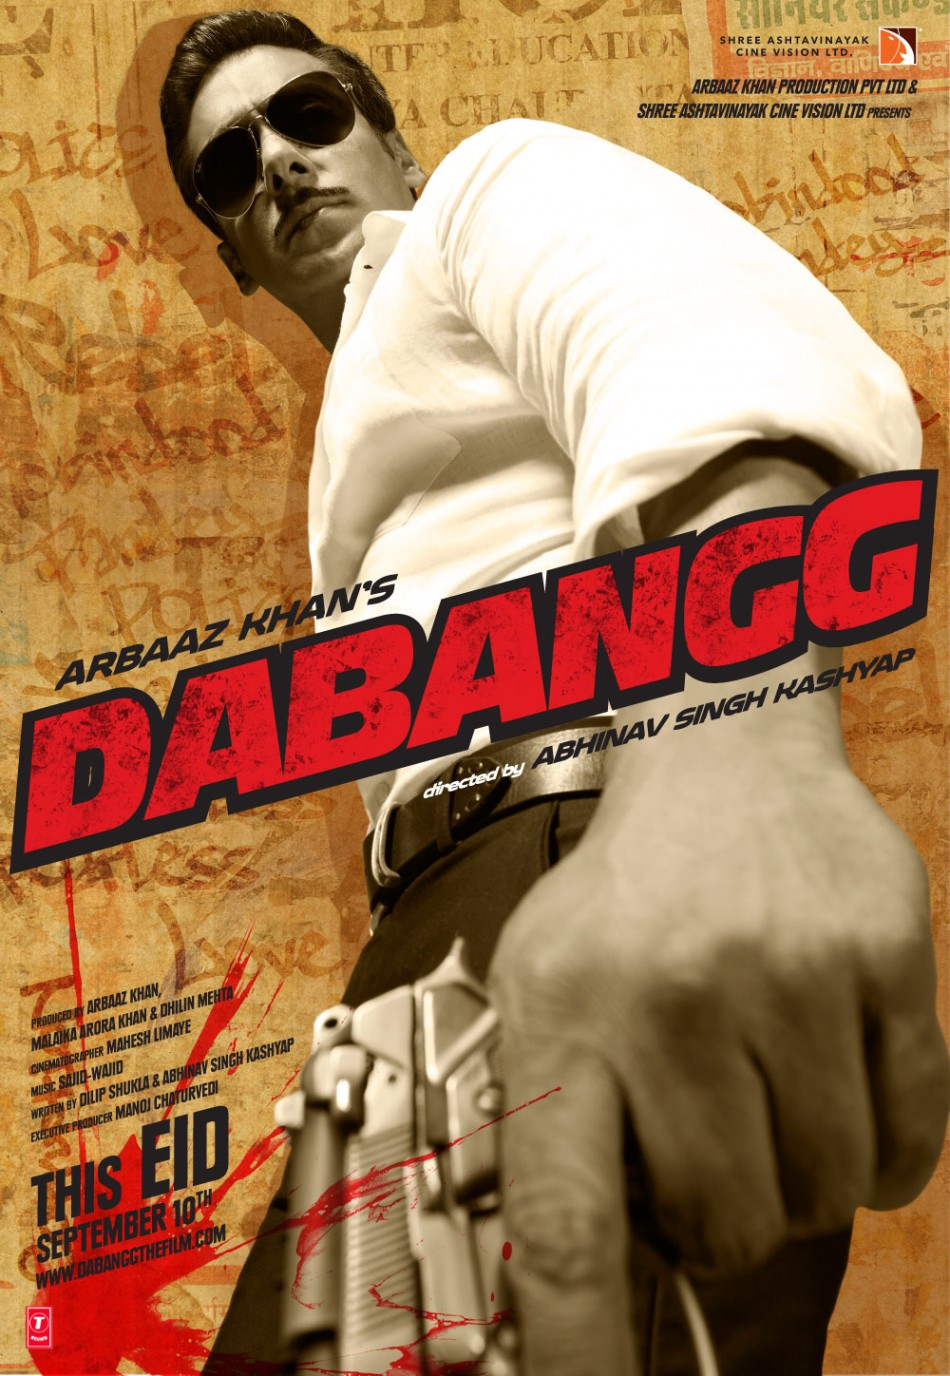 'Dabangg 2' Fifth Weekend Overseas Box Office Collection ... Dabangg 2